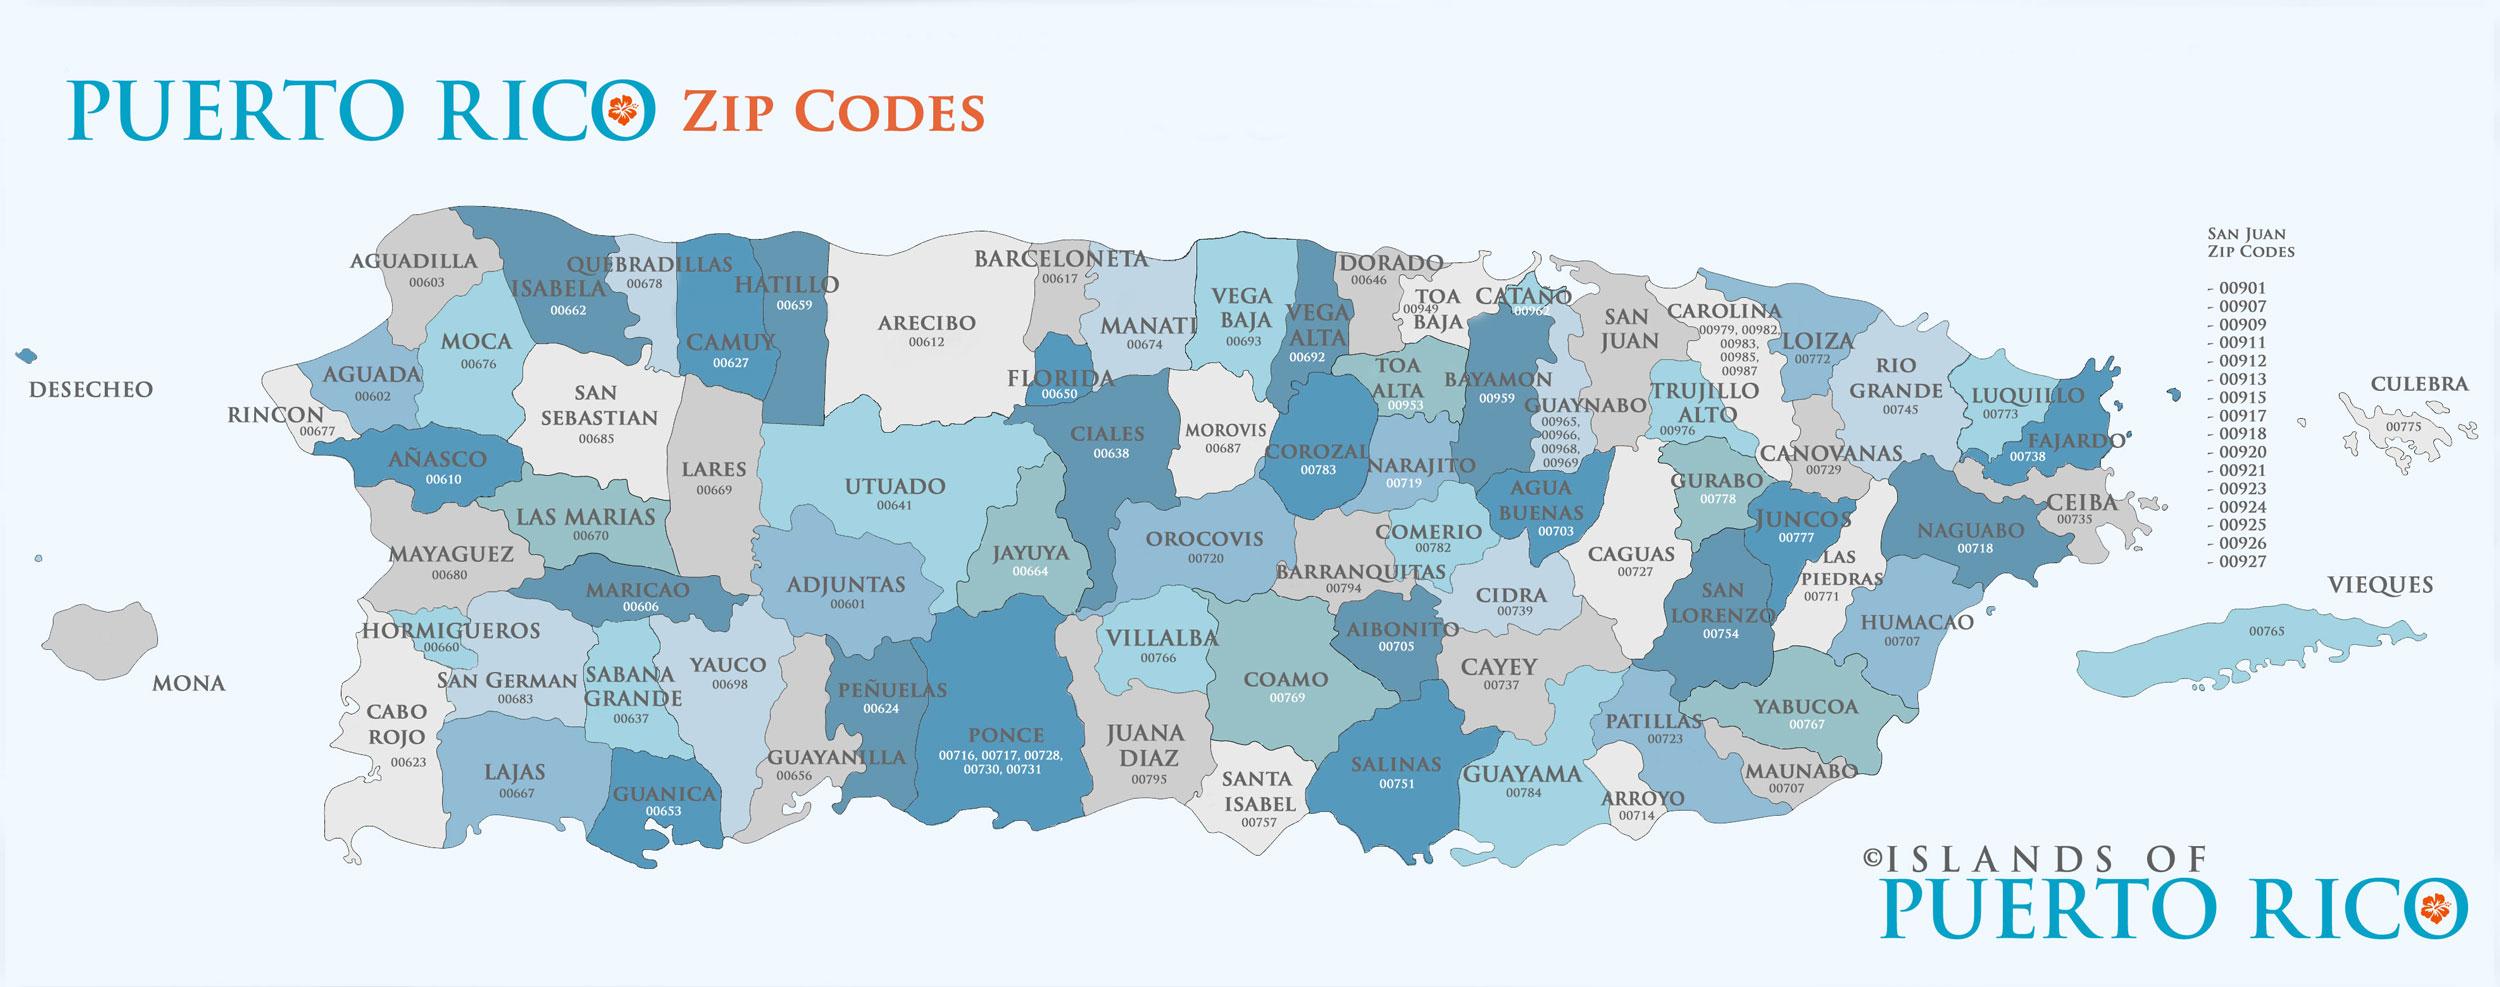 Area Code Spreadsheet Within Puerto Rico Zip Code  Area Code List  Easy To Use Puerto Rico Zip Area Code Spreadsheet Printable Spreadshee Printable Spreadshee area code spreadsheet